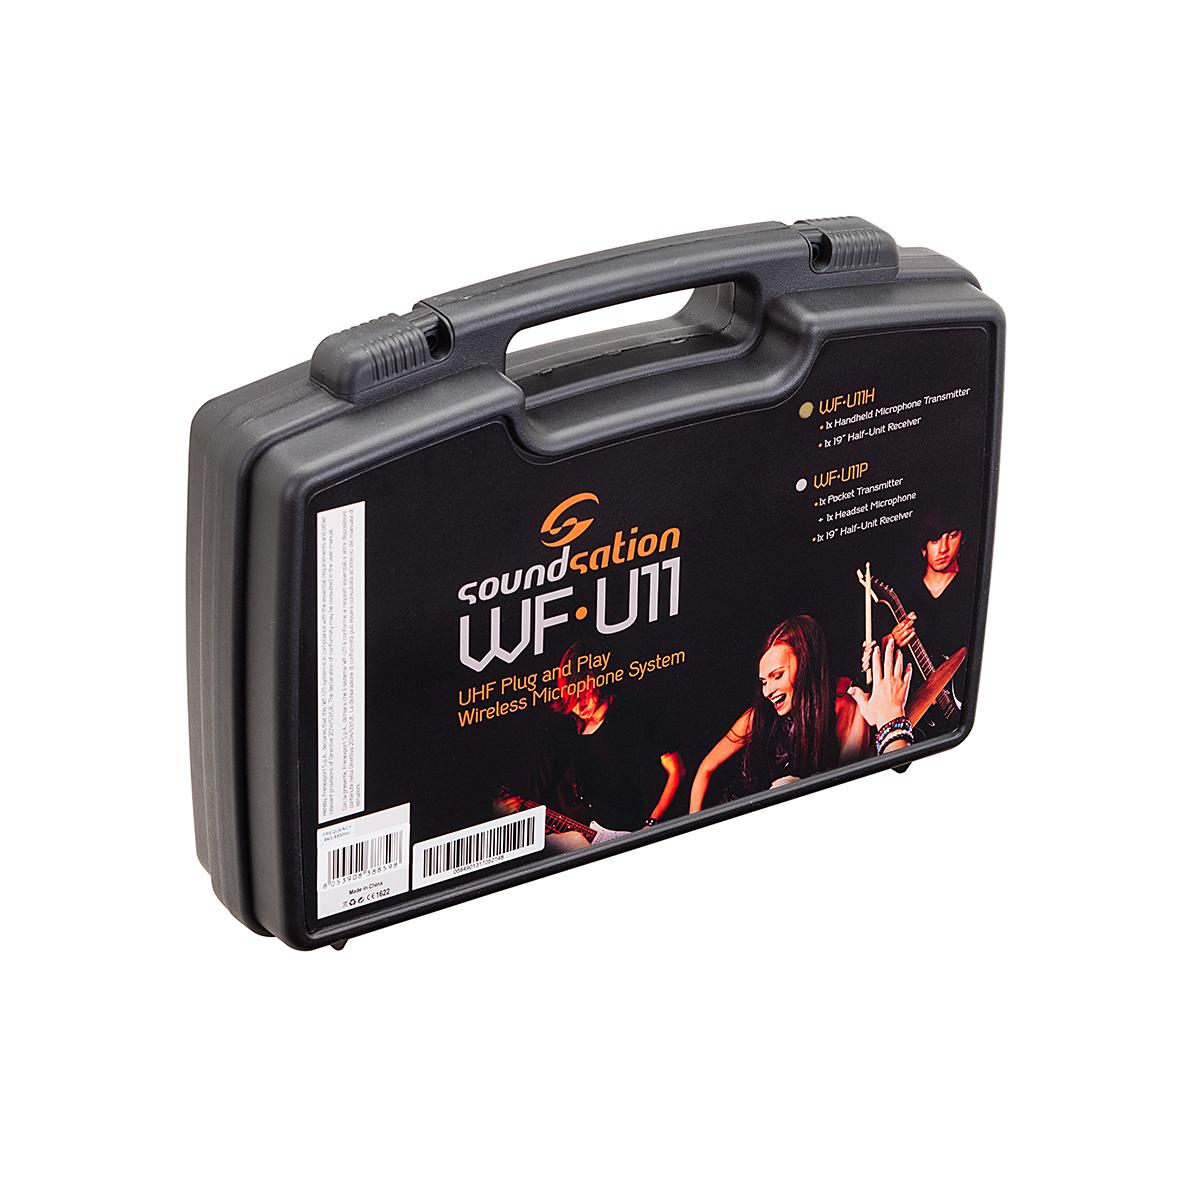 RADIOMICROFONO UHF SOUNDSATION WF-U11HD TX A MANO 865.00 MHz